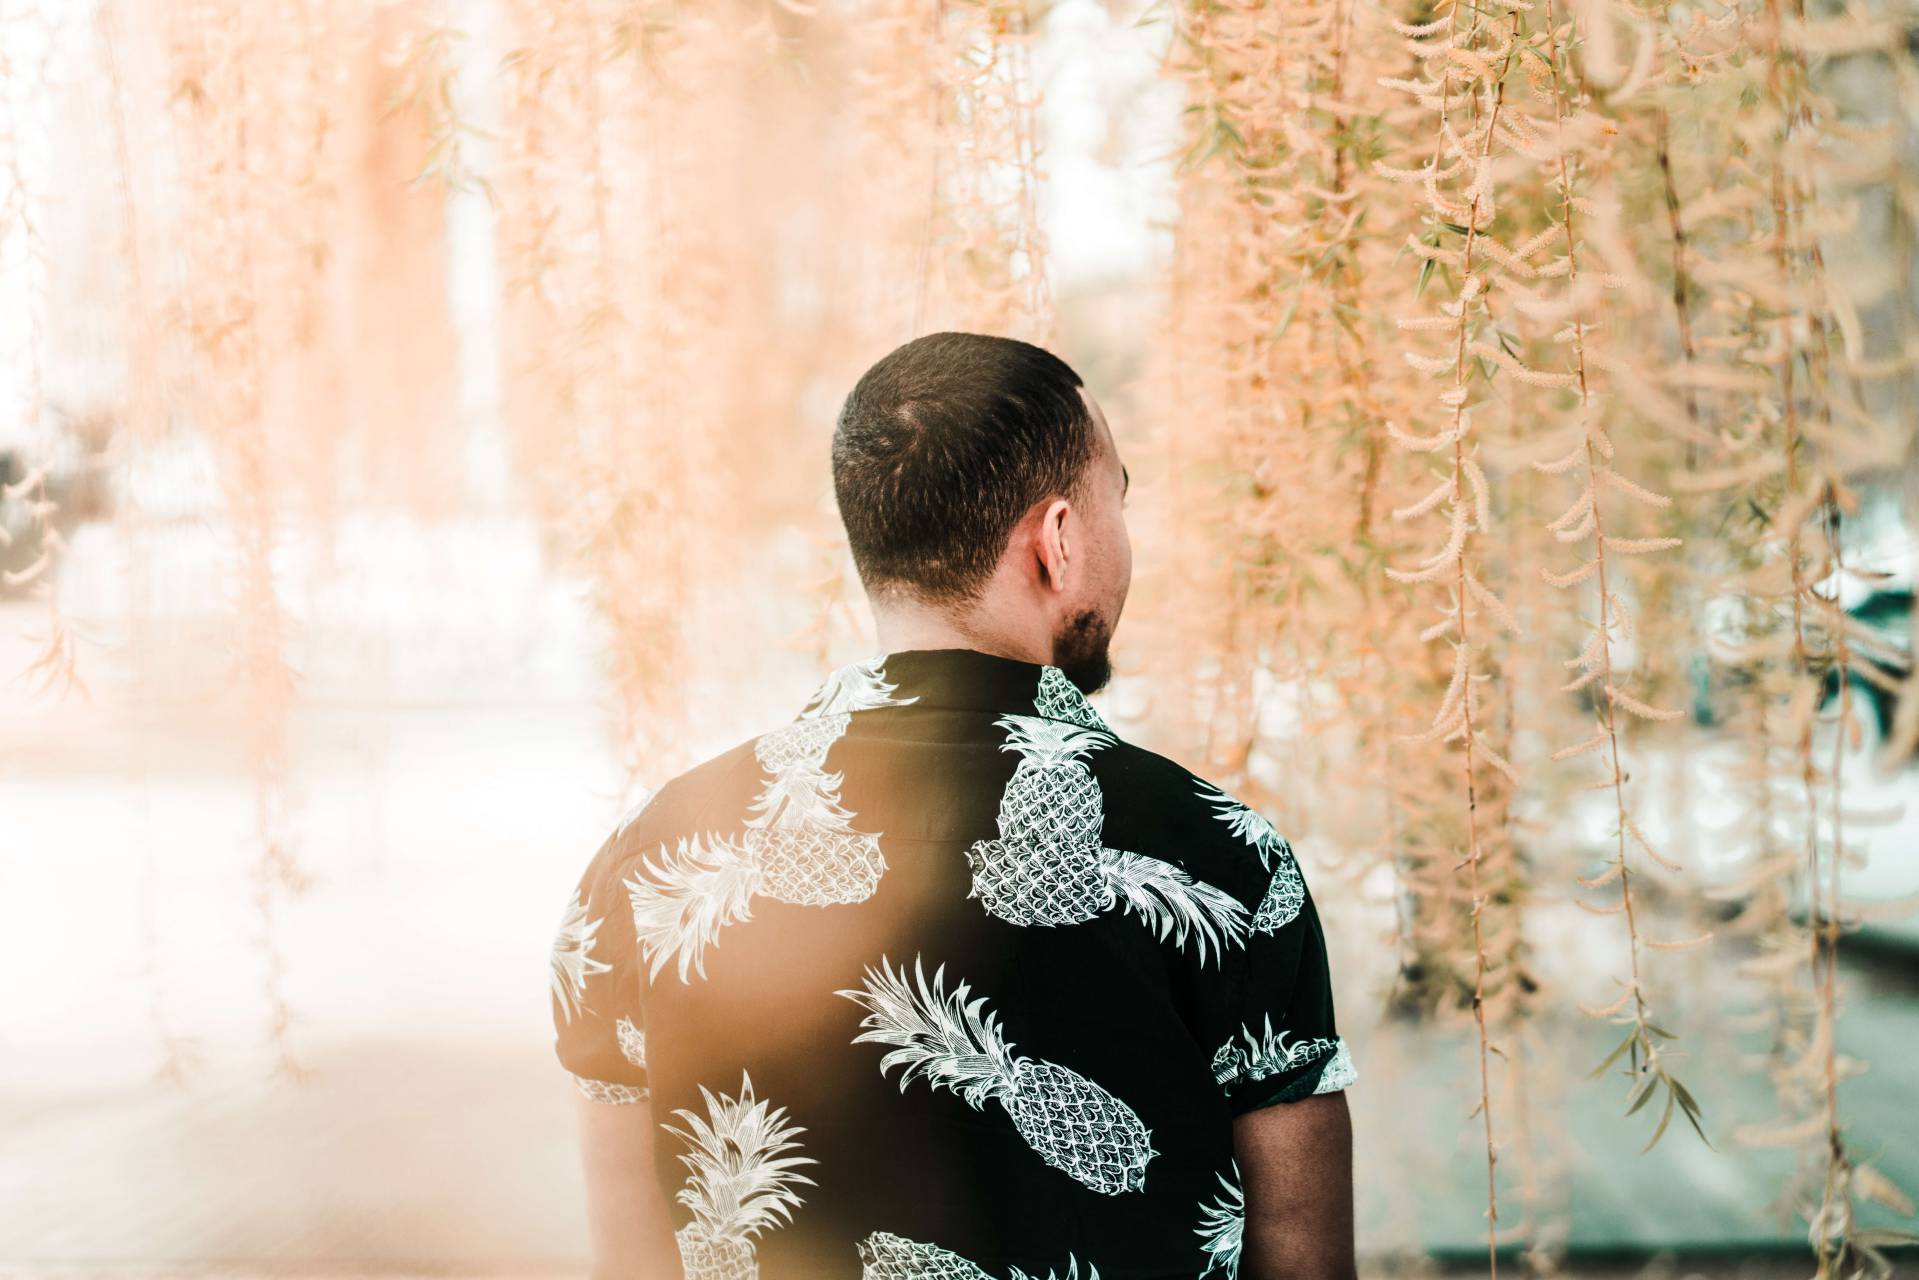 Hawaiiskjortan populär igen, Foto: Javon Swaby